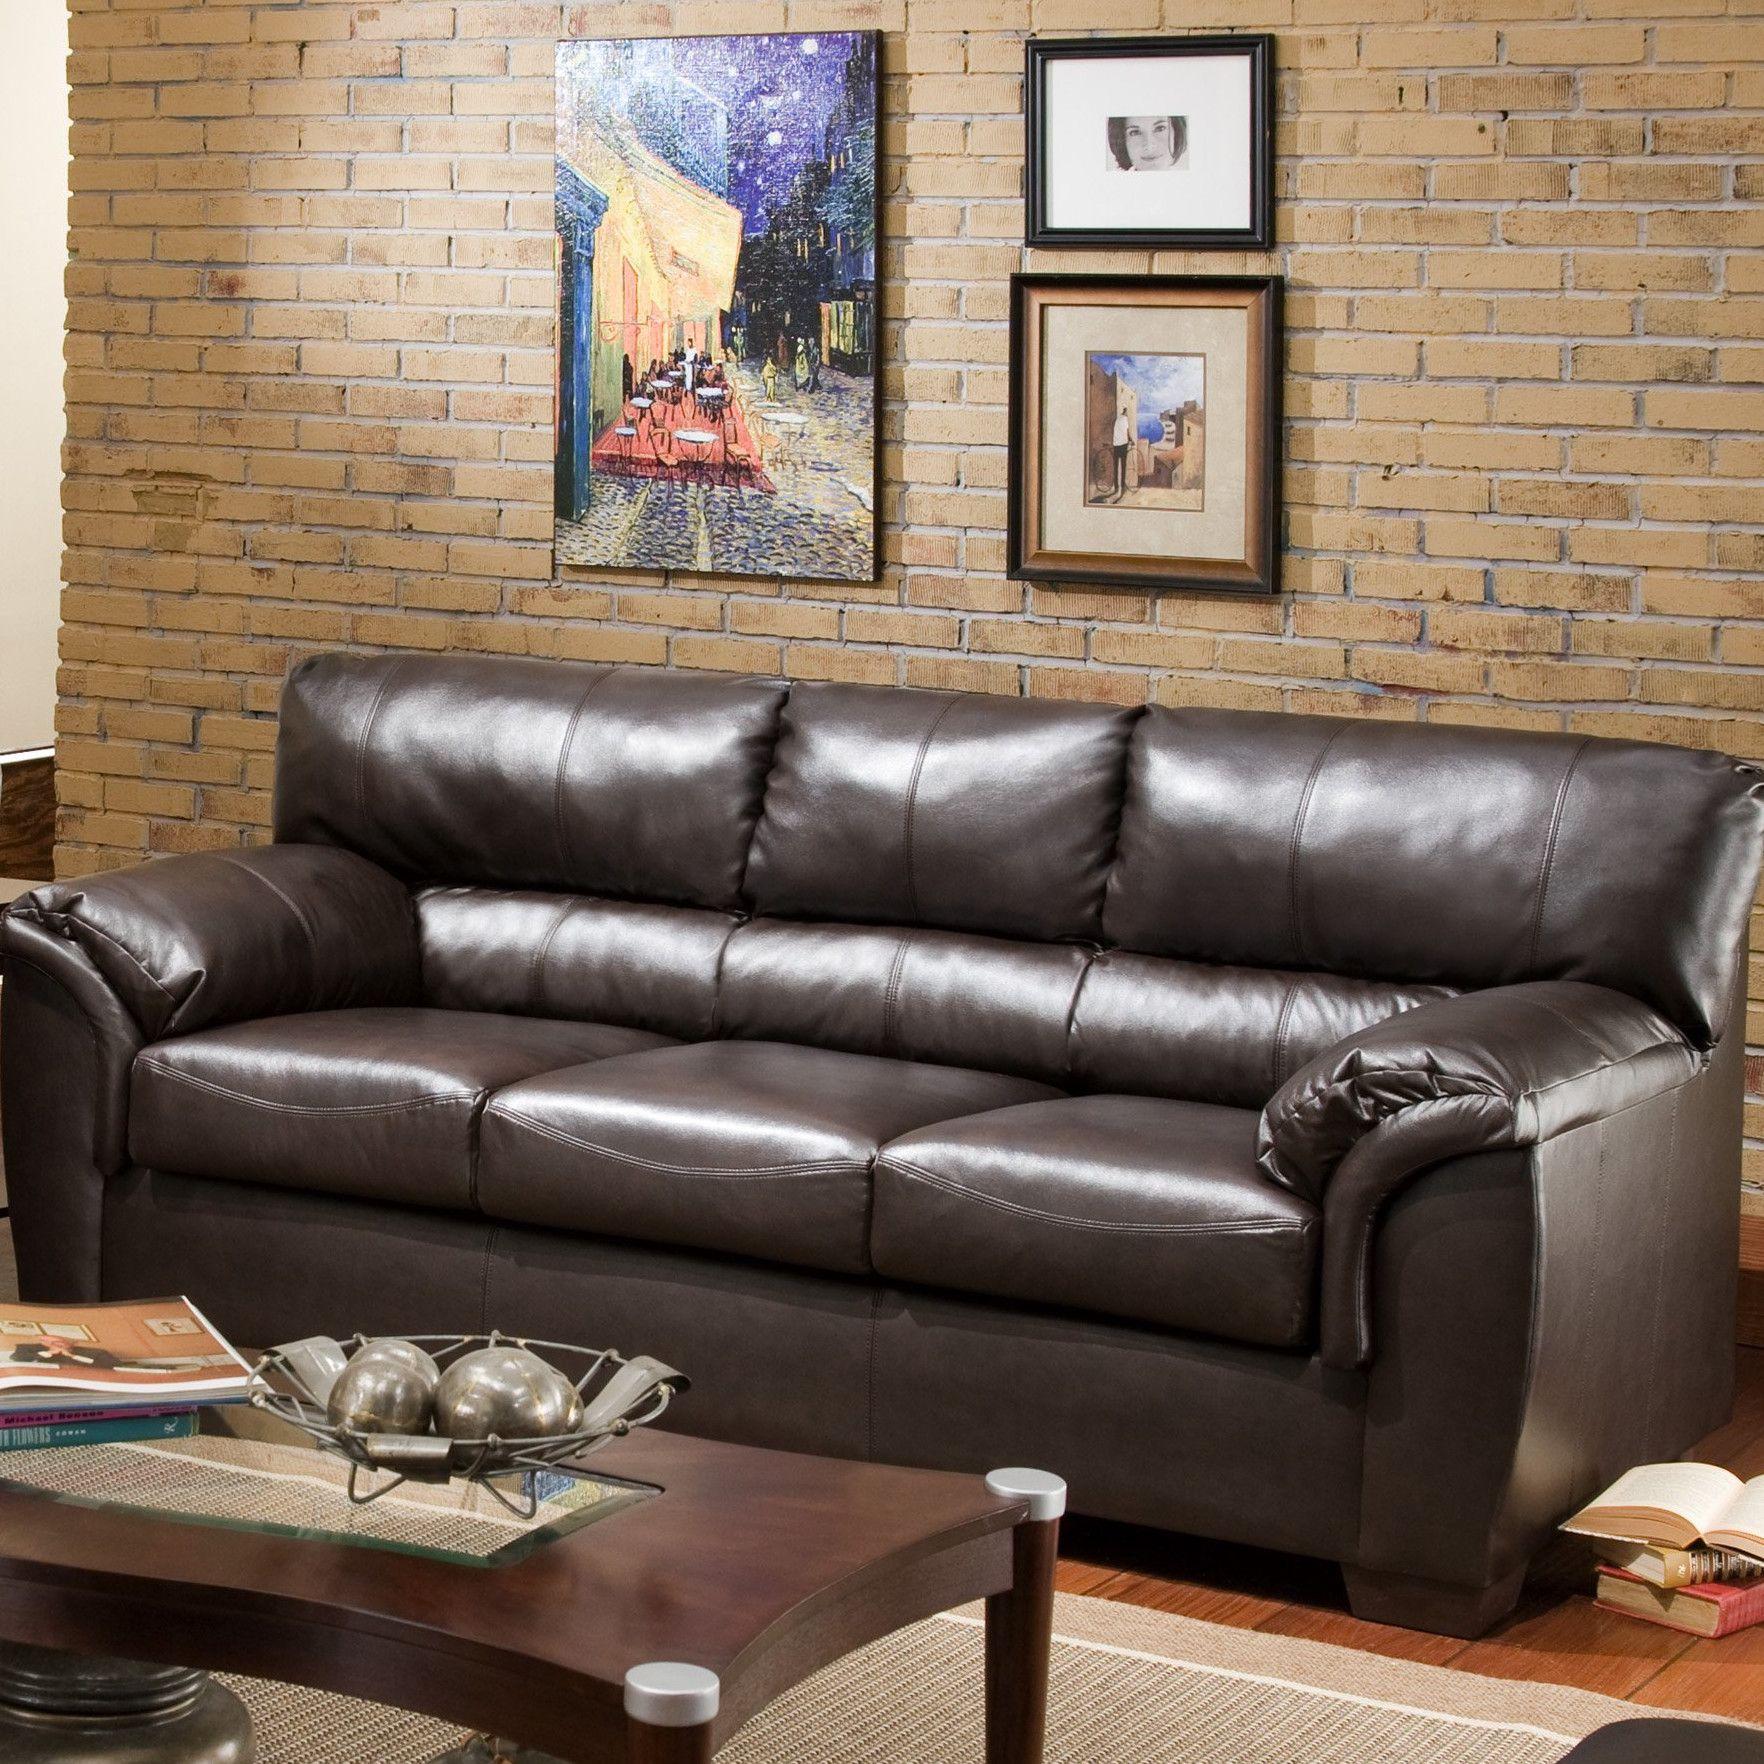 Admirable Simmons Upholstery London Sofa Living Room Designs Full Machost Co Dining Chair Design Ideas Machostcouk